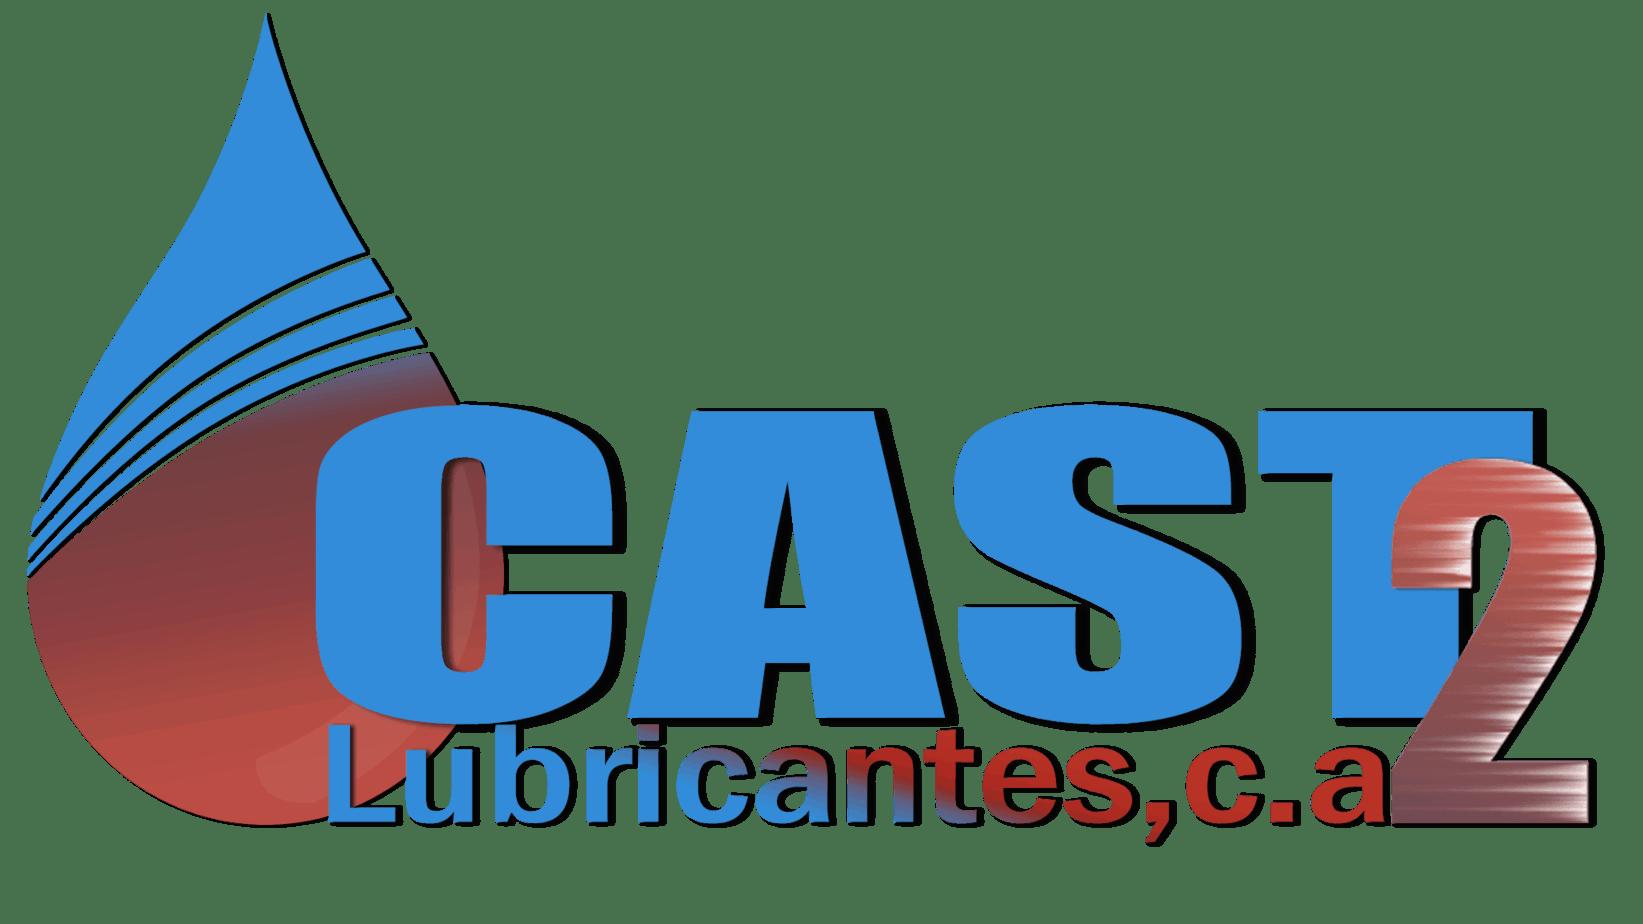 Cast2 Lubricantes